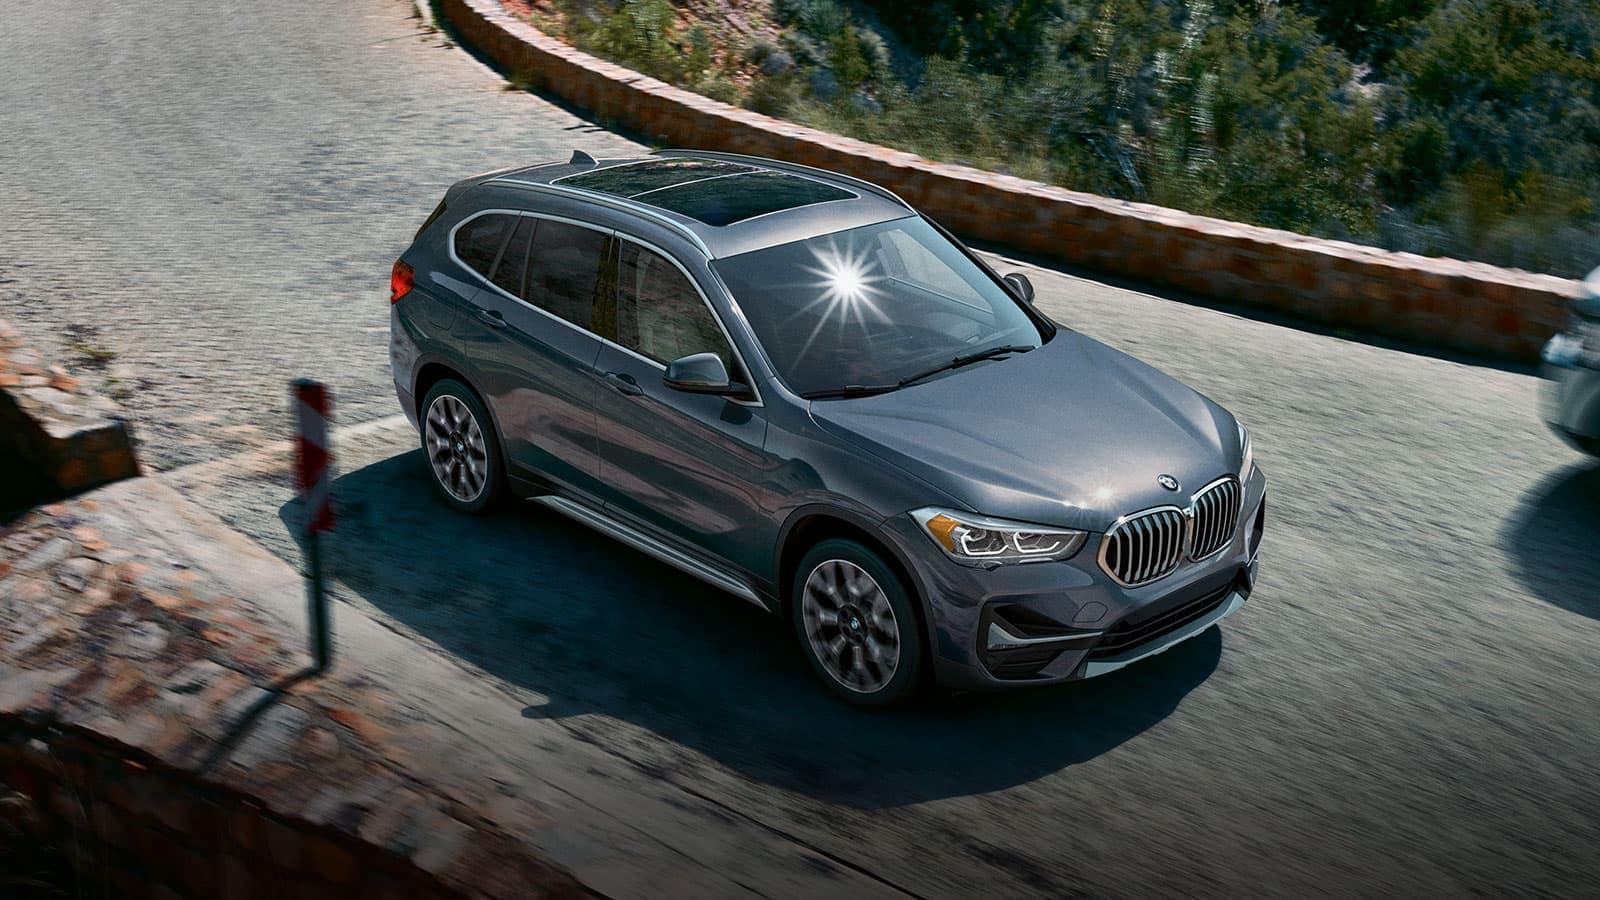 2020 BMW X1 driving